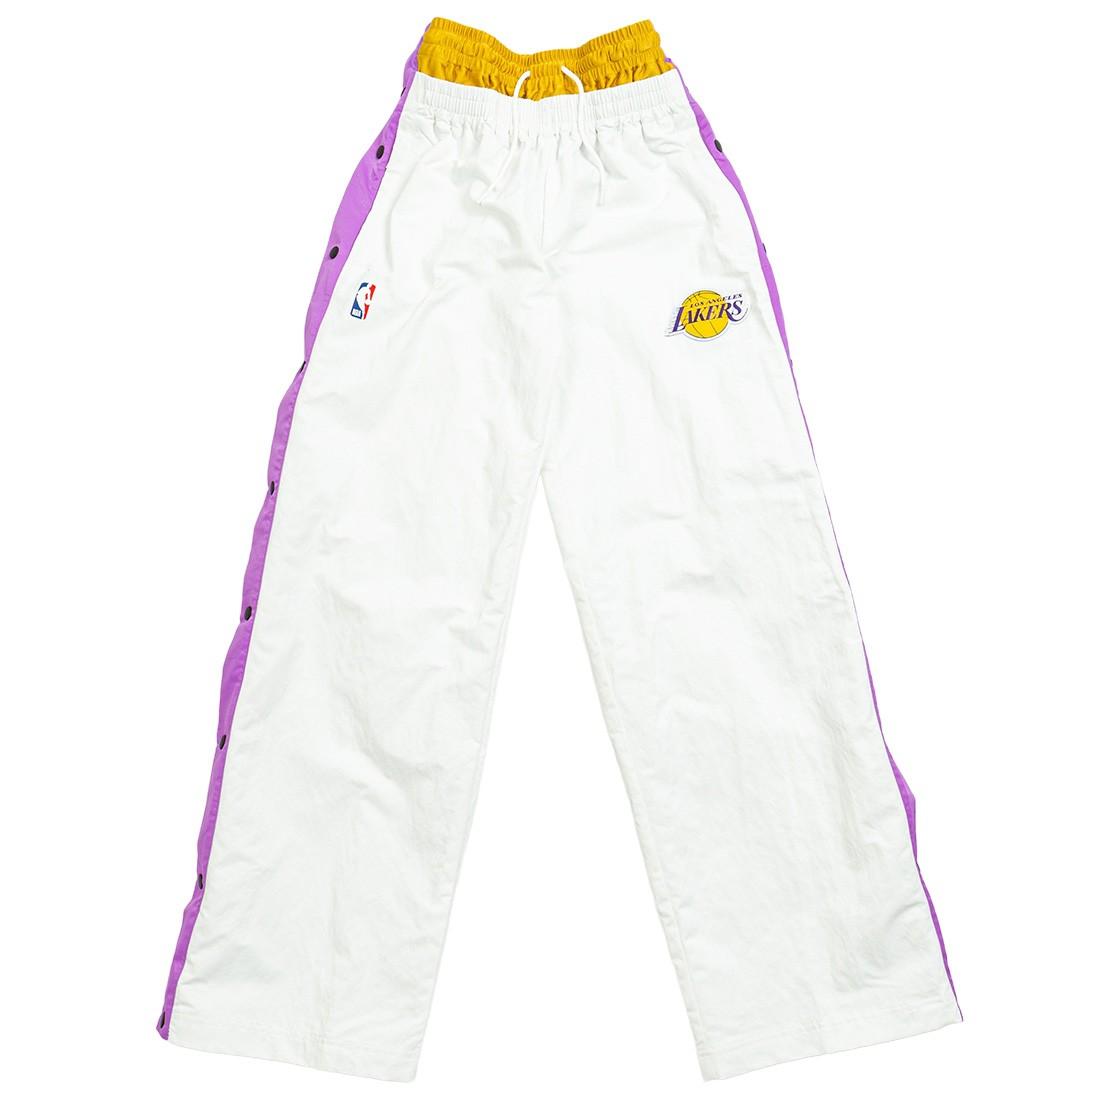 Nike Women W Nrg Ir Tearaway Pants Los Angeles Lakers (summit white)